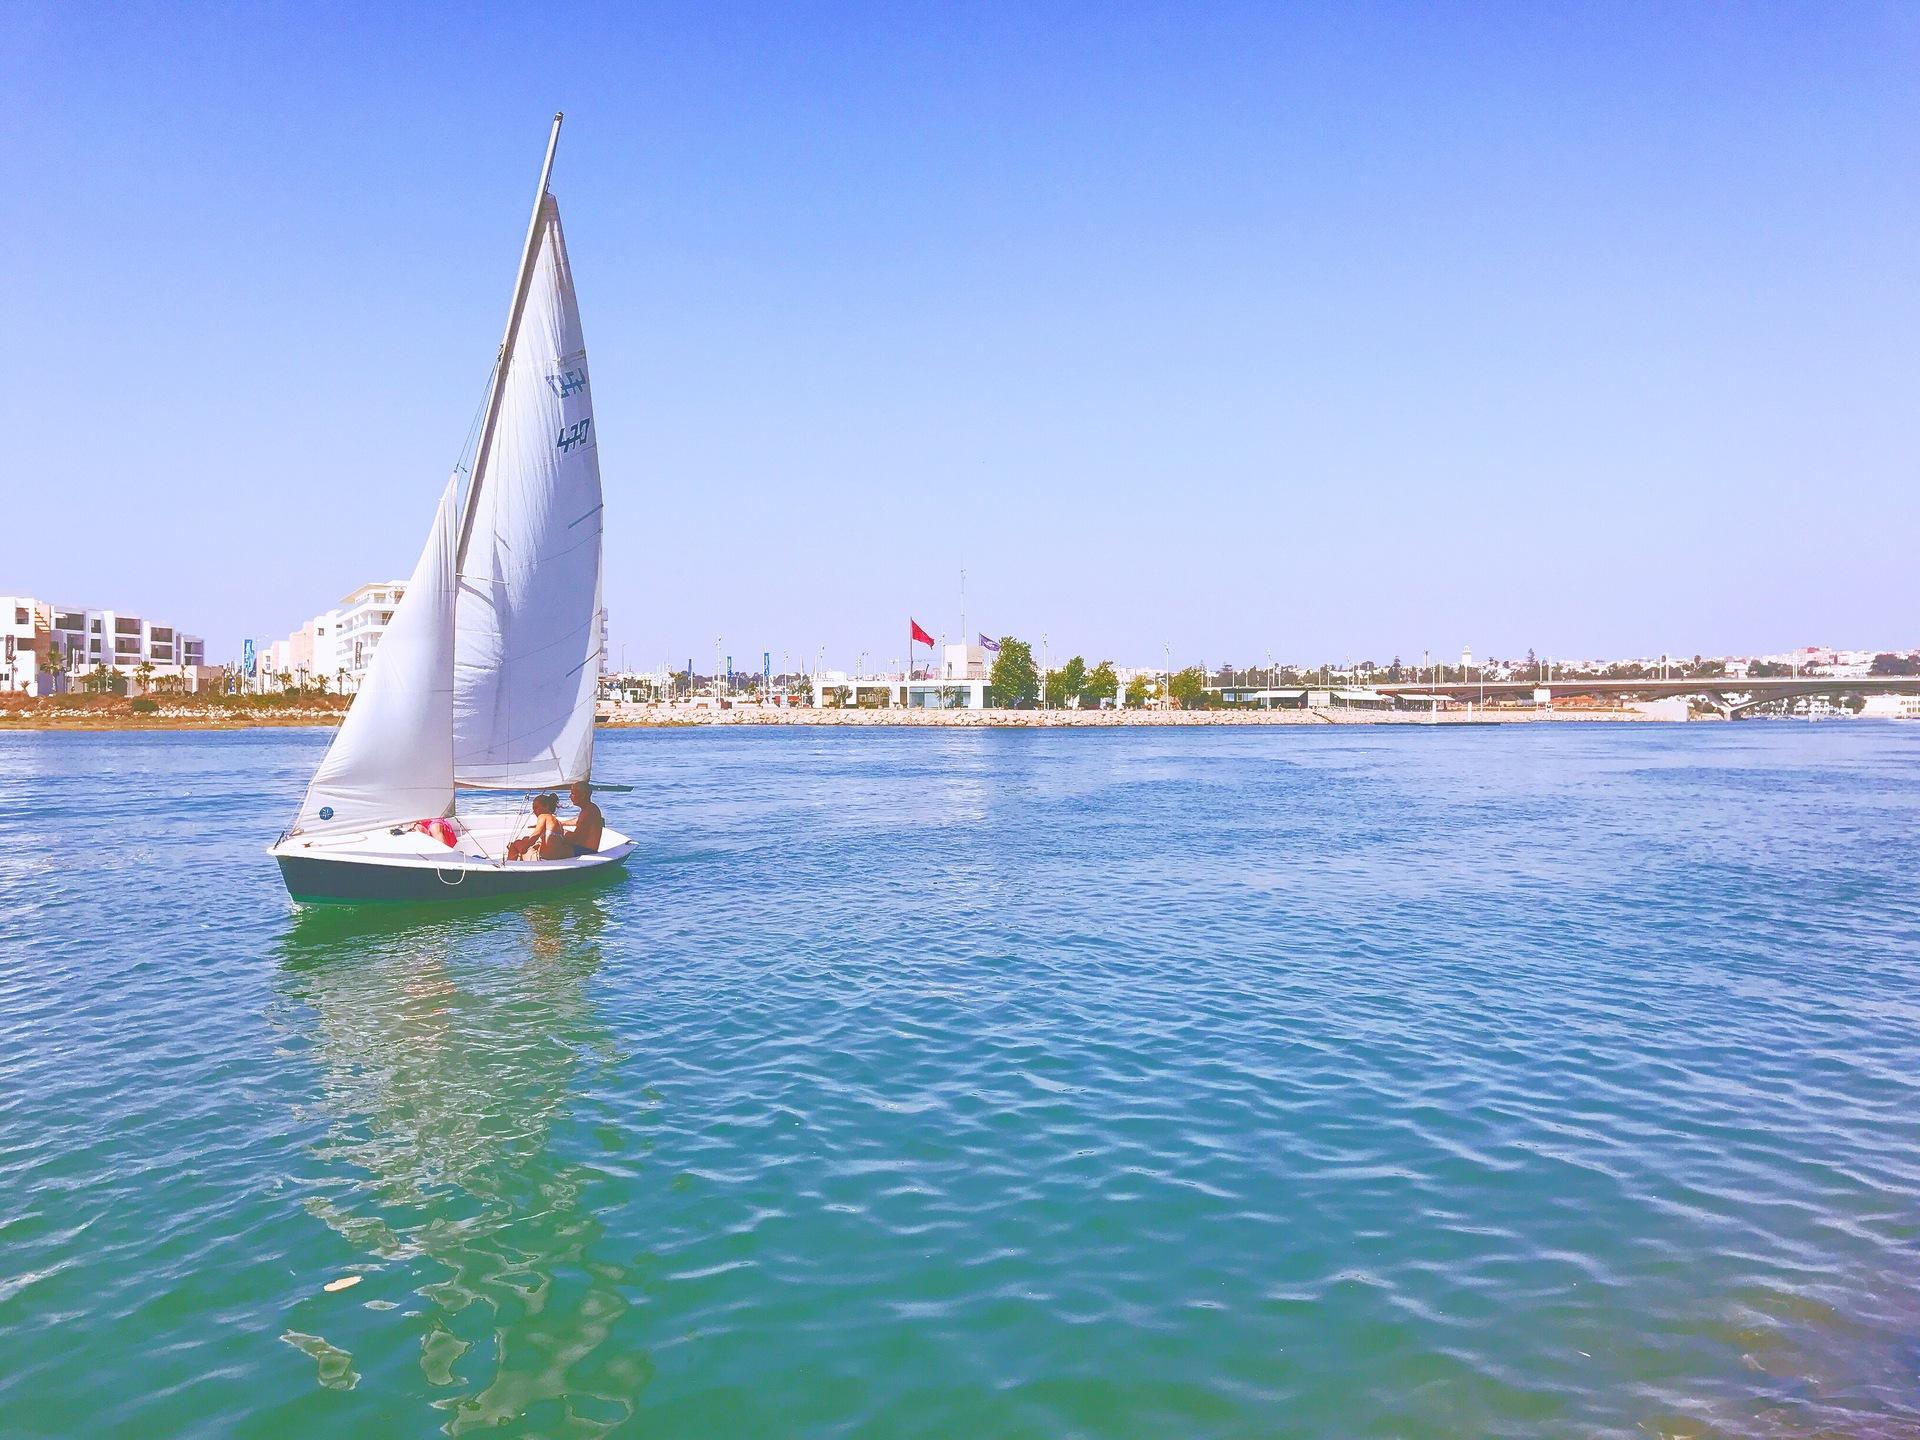 Marina | water sports, outdoors, seashore, vacation